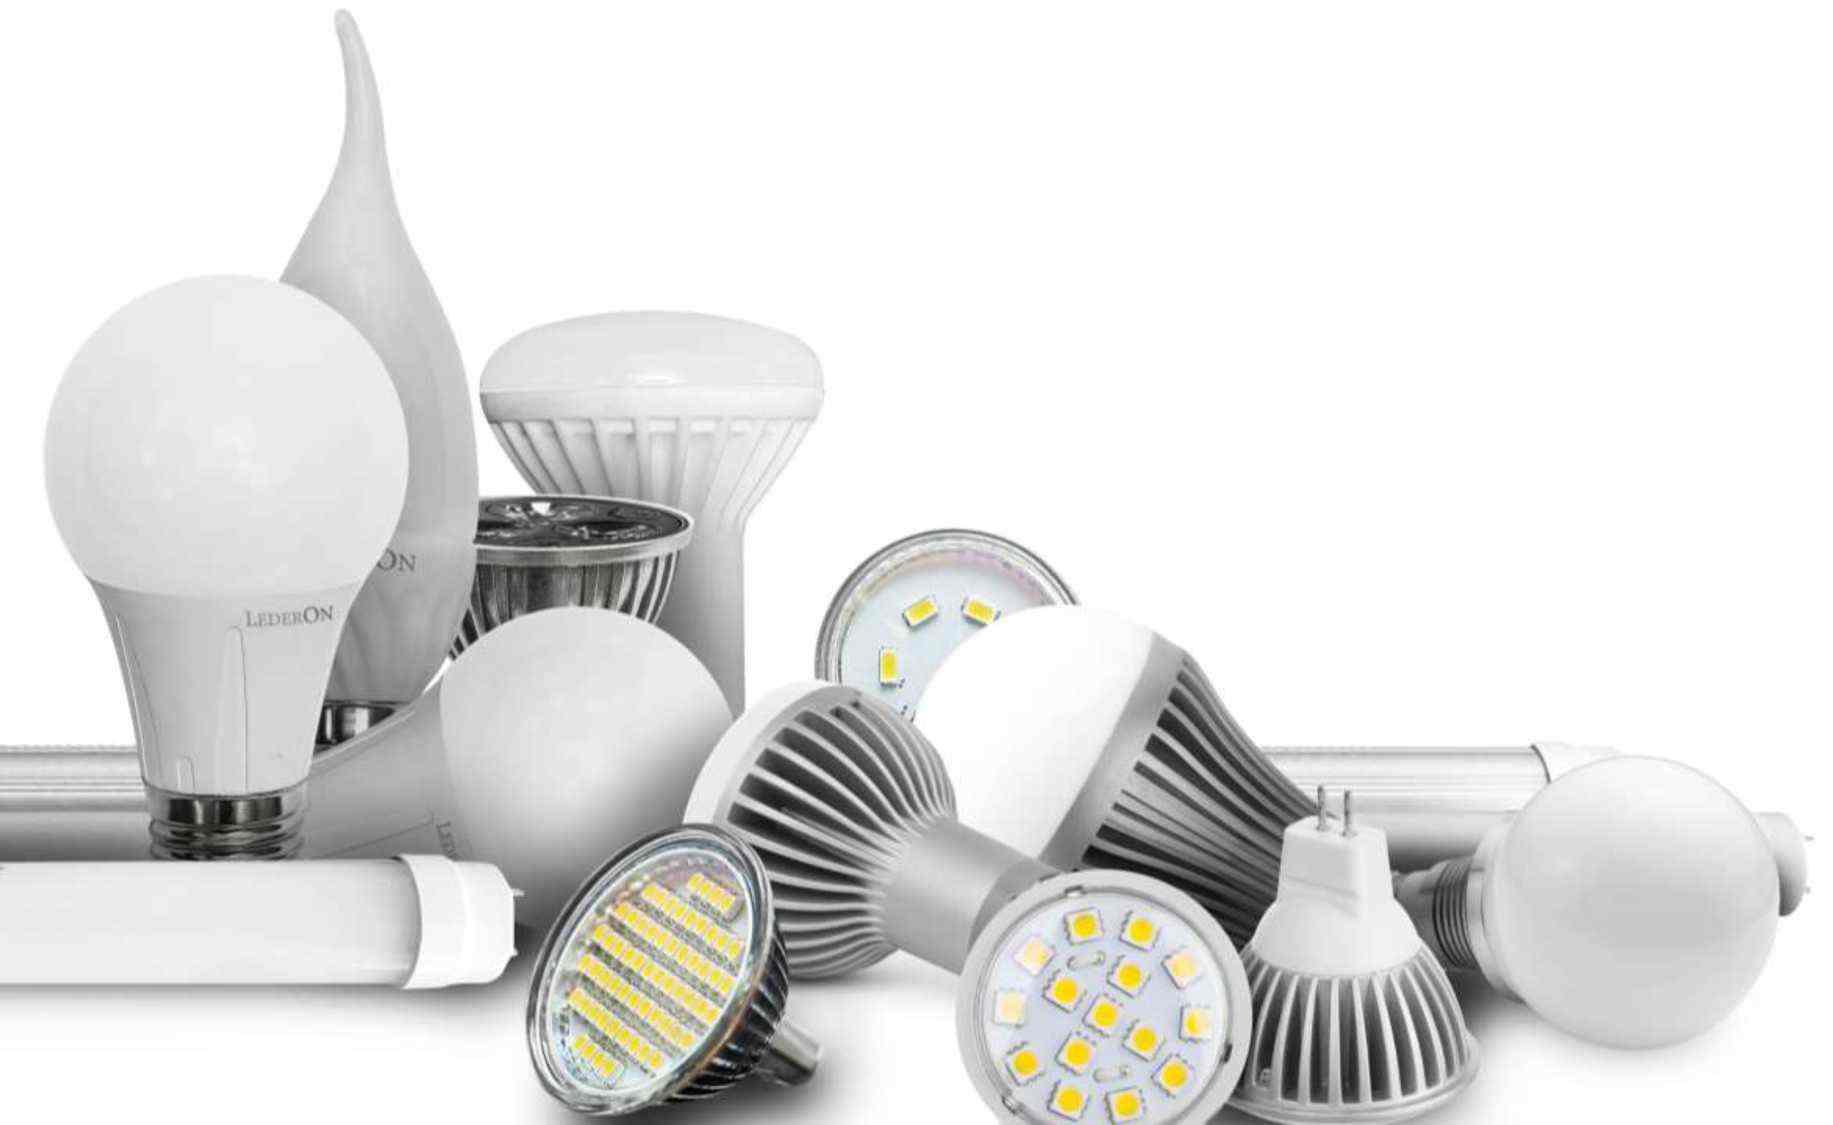 сколько электричества экономит led лампа